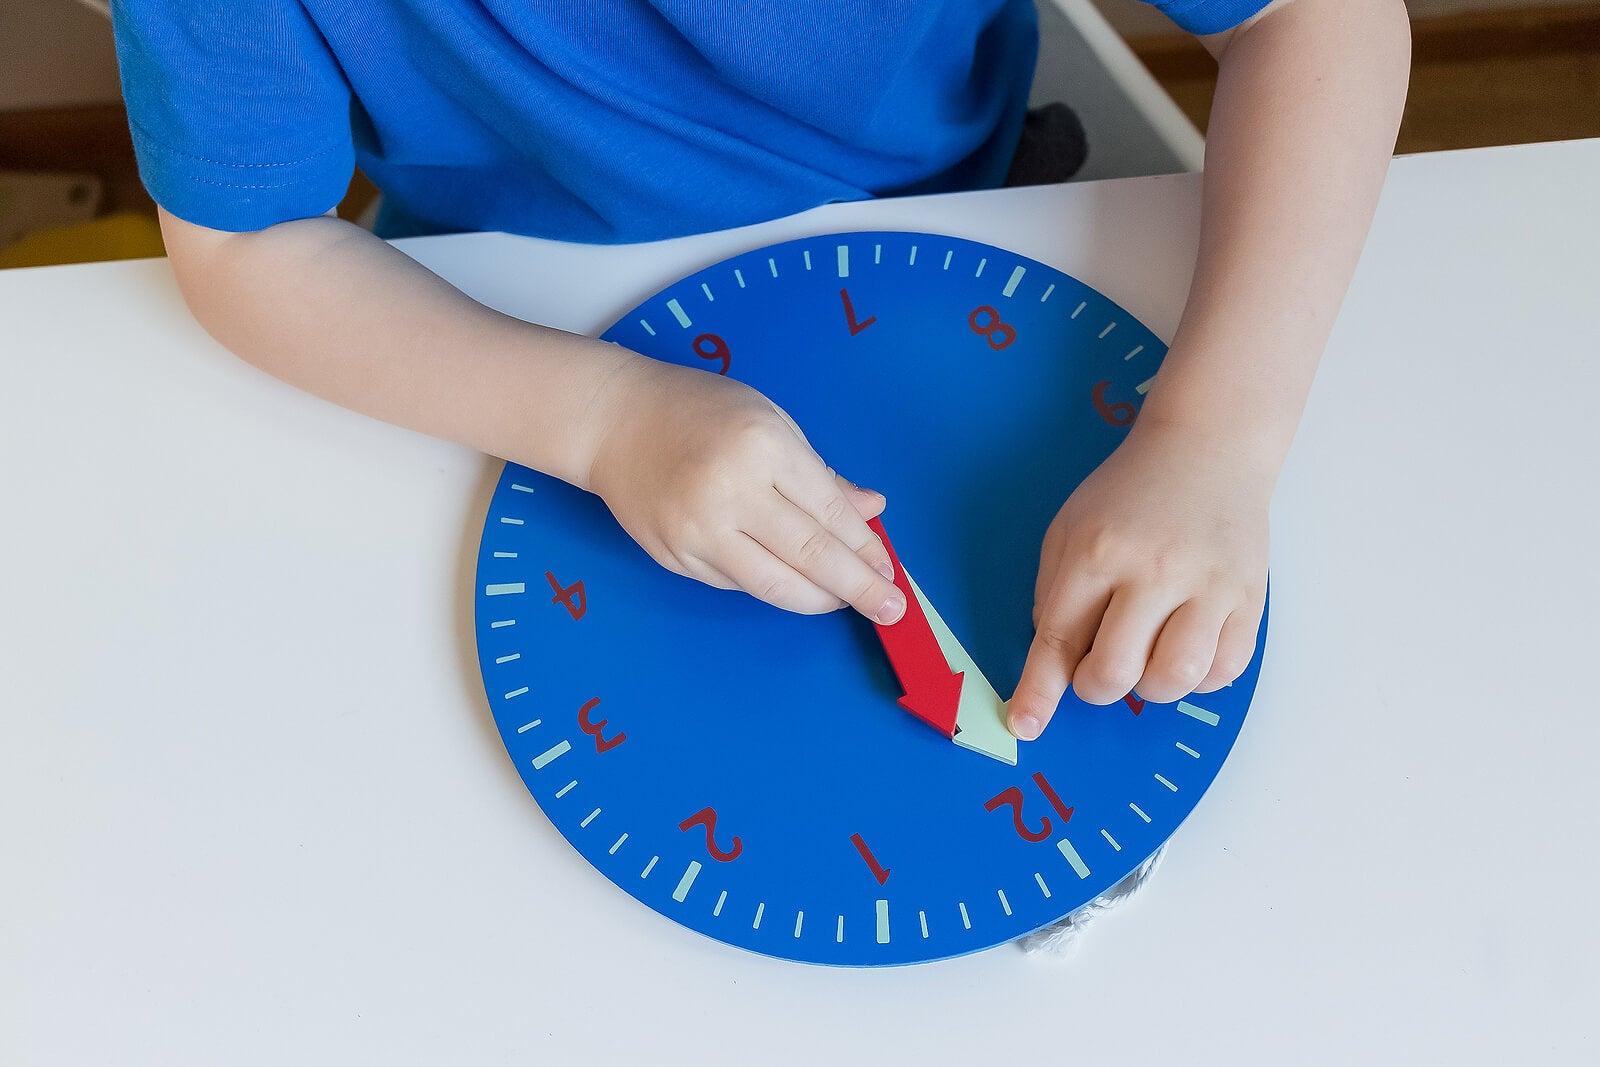 Niño aprendiendo matemáticas con un reloj gracias al método Montessori.